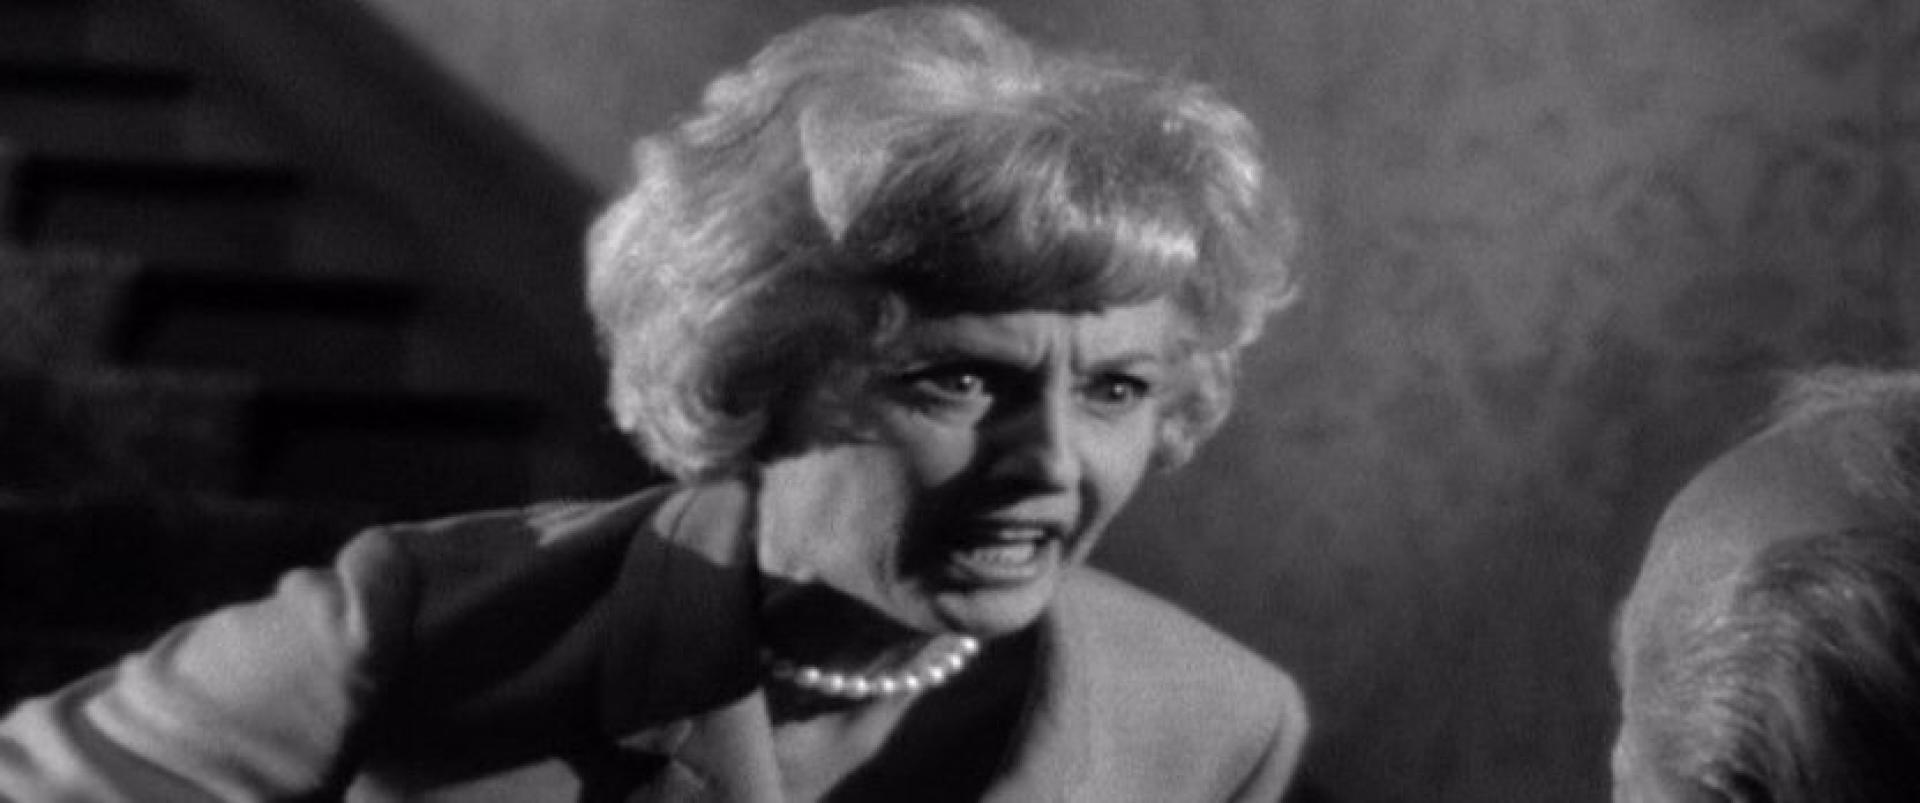 CreepyClassics VII. - The Night Walker (1964)